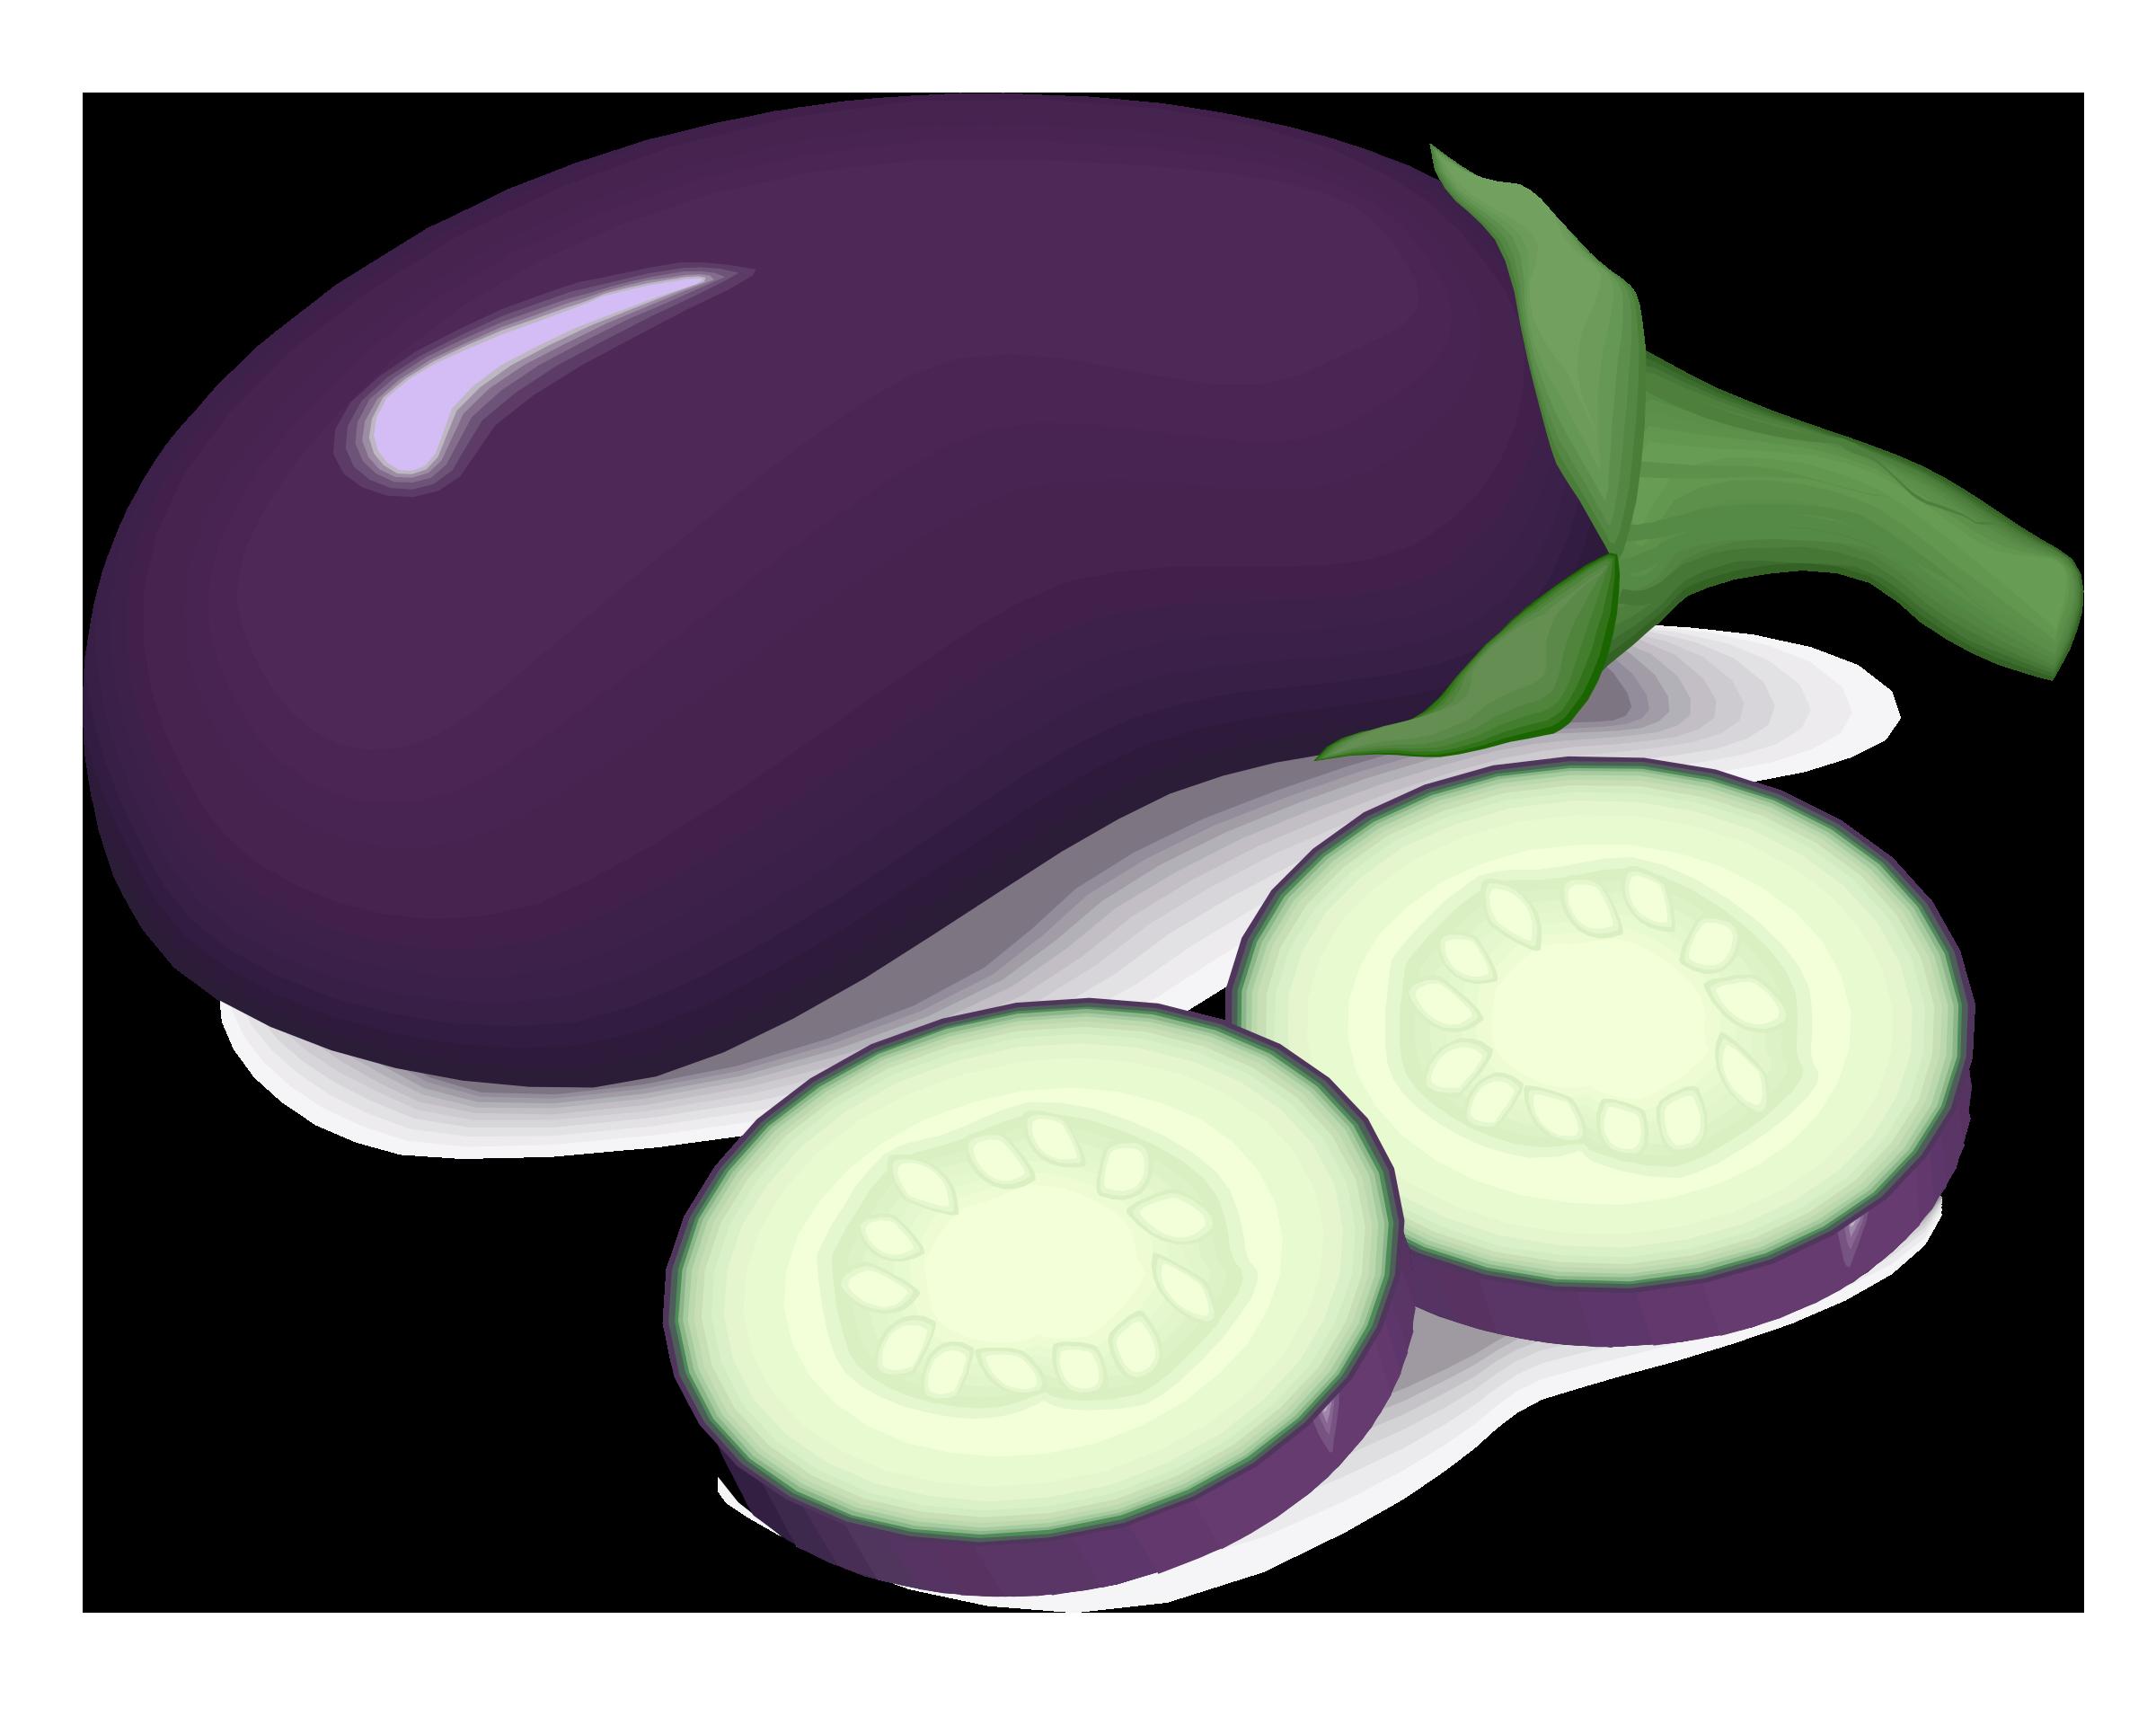 2400x1930 Free Stock Photo Of Purple Eggplant Vector Clipart